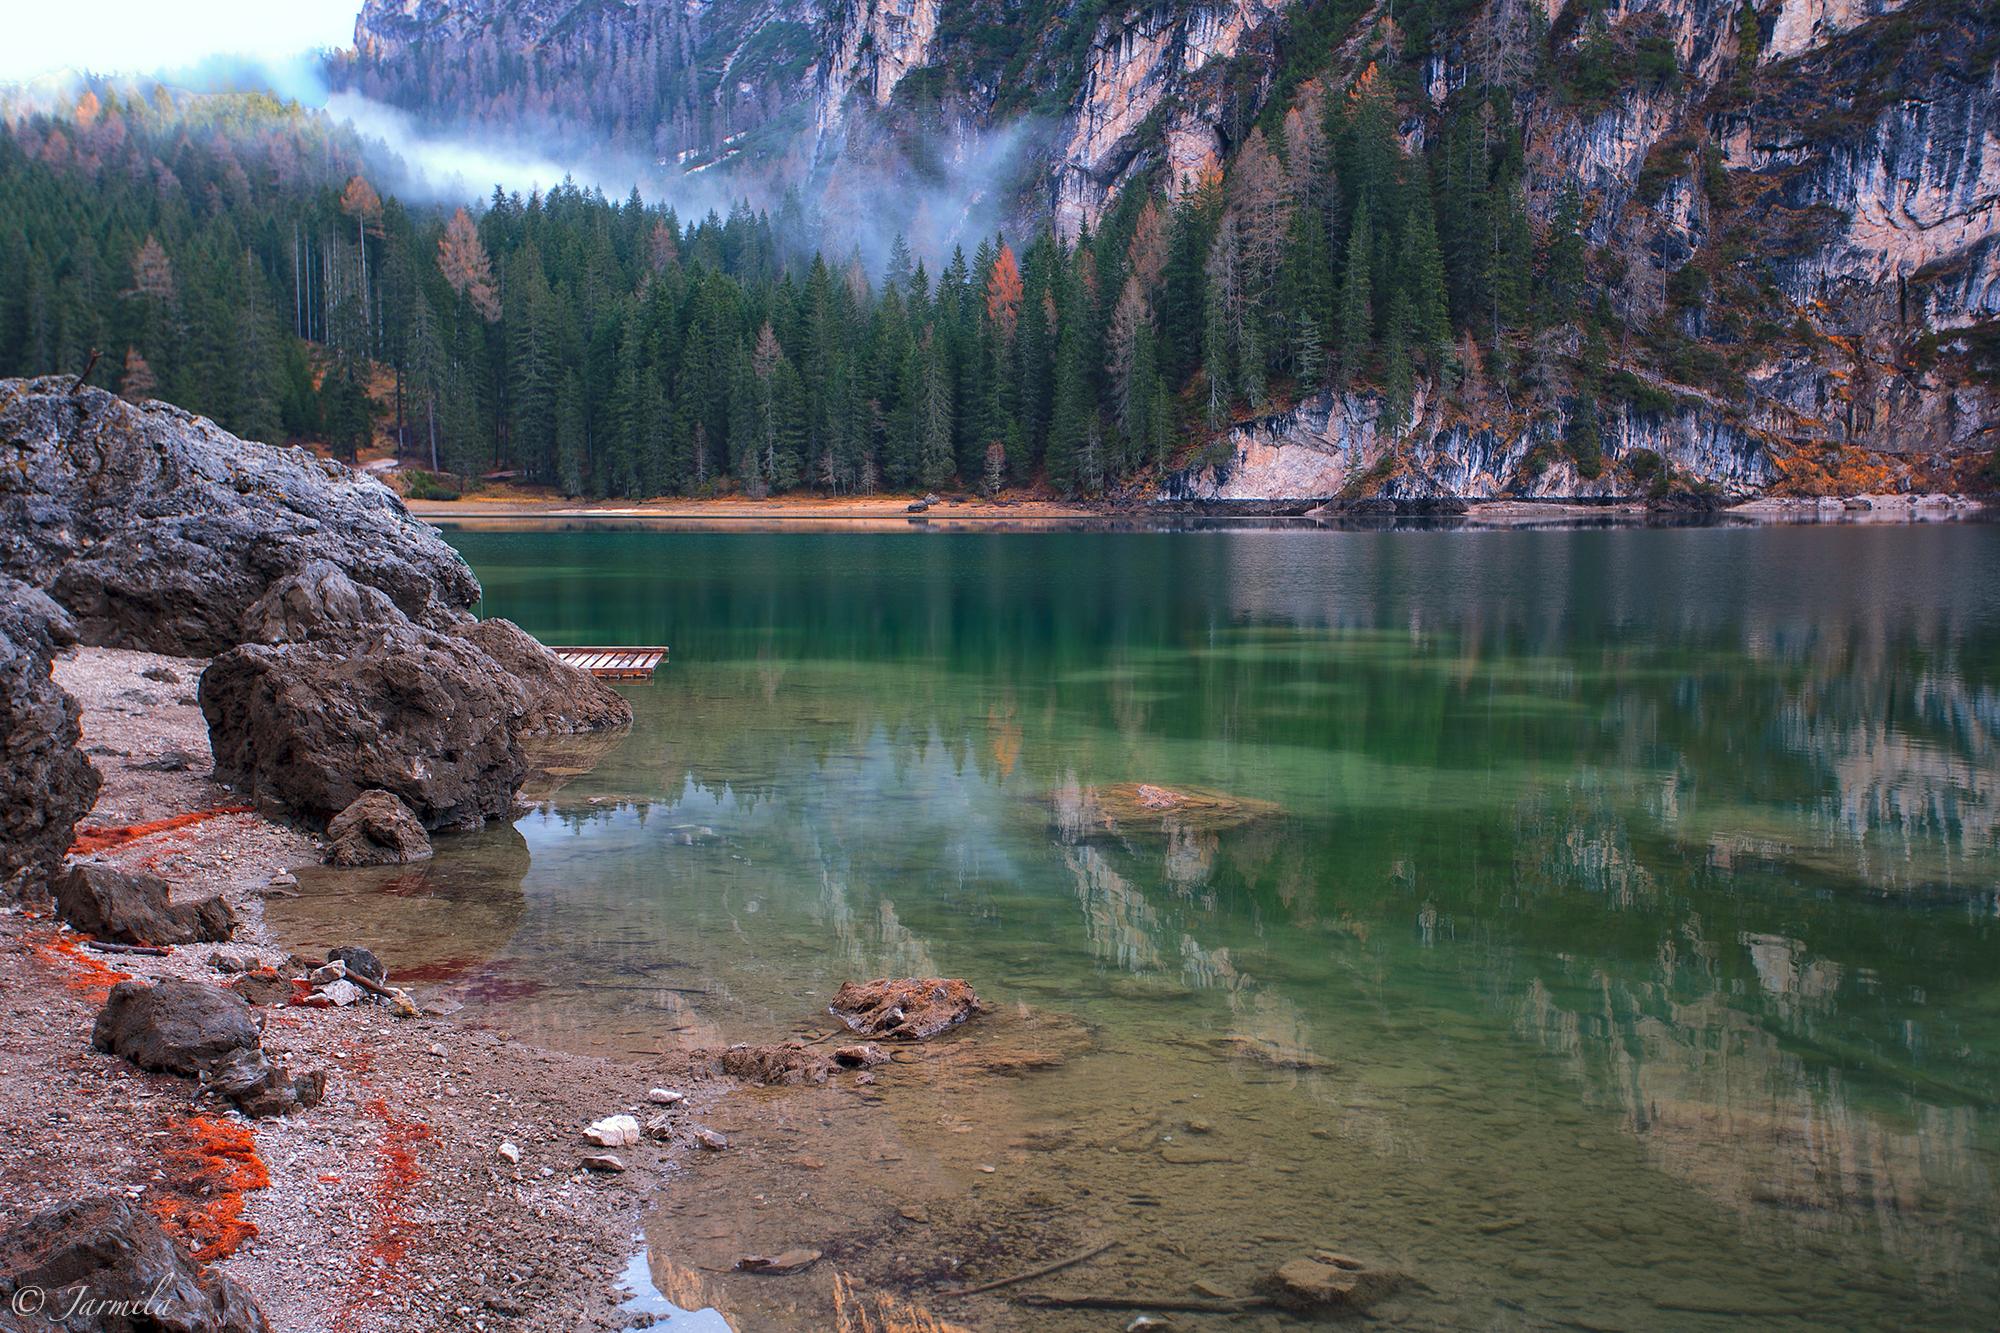 Lago di Braies - un polmone verde nelle Dolomiti...